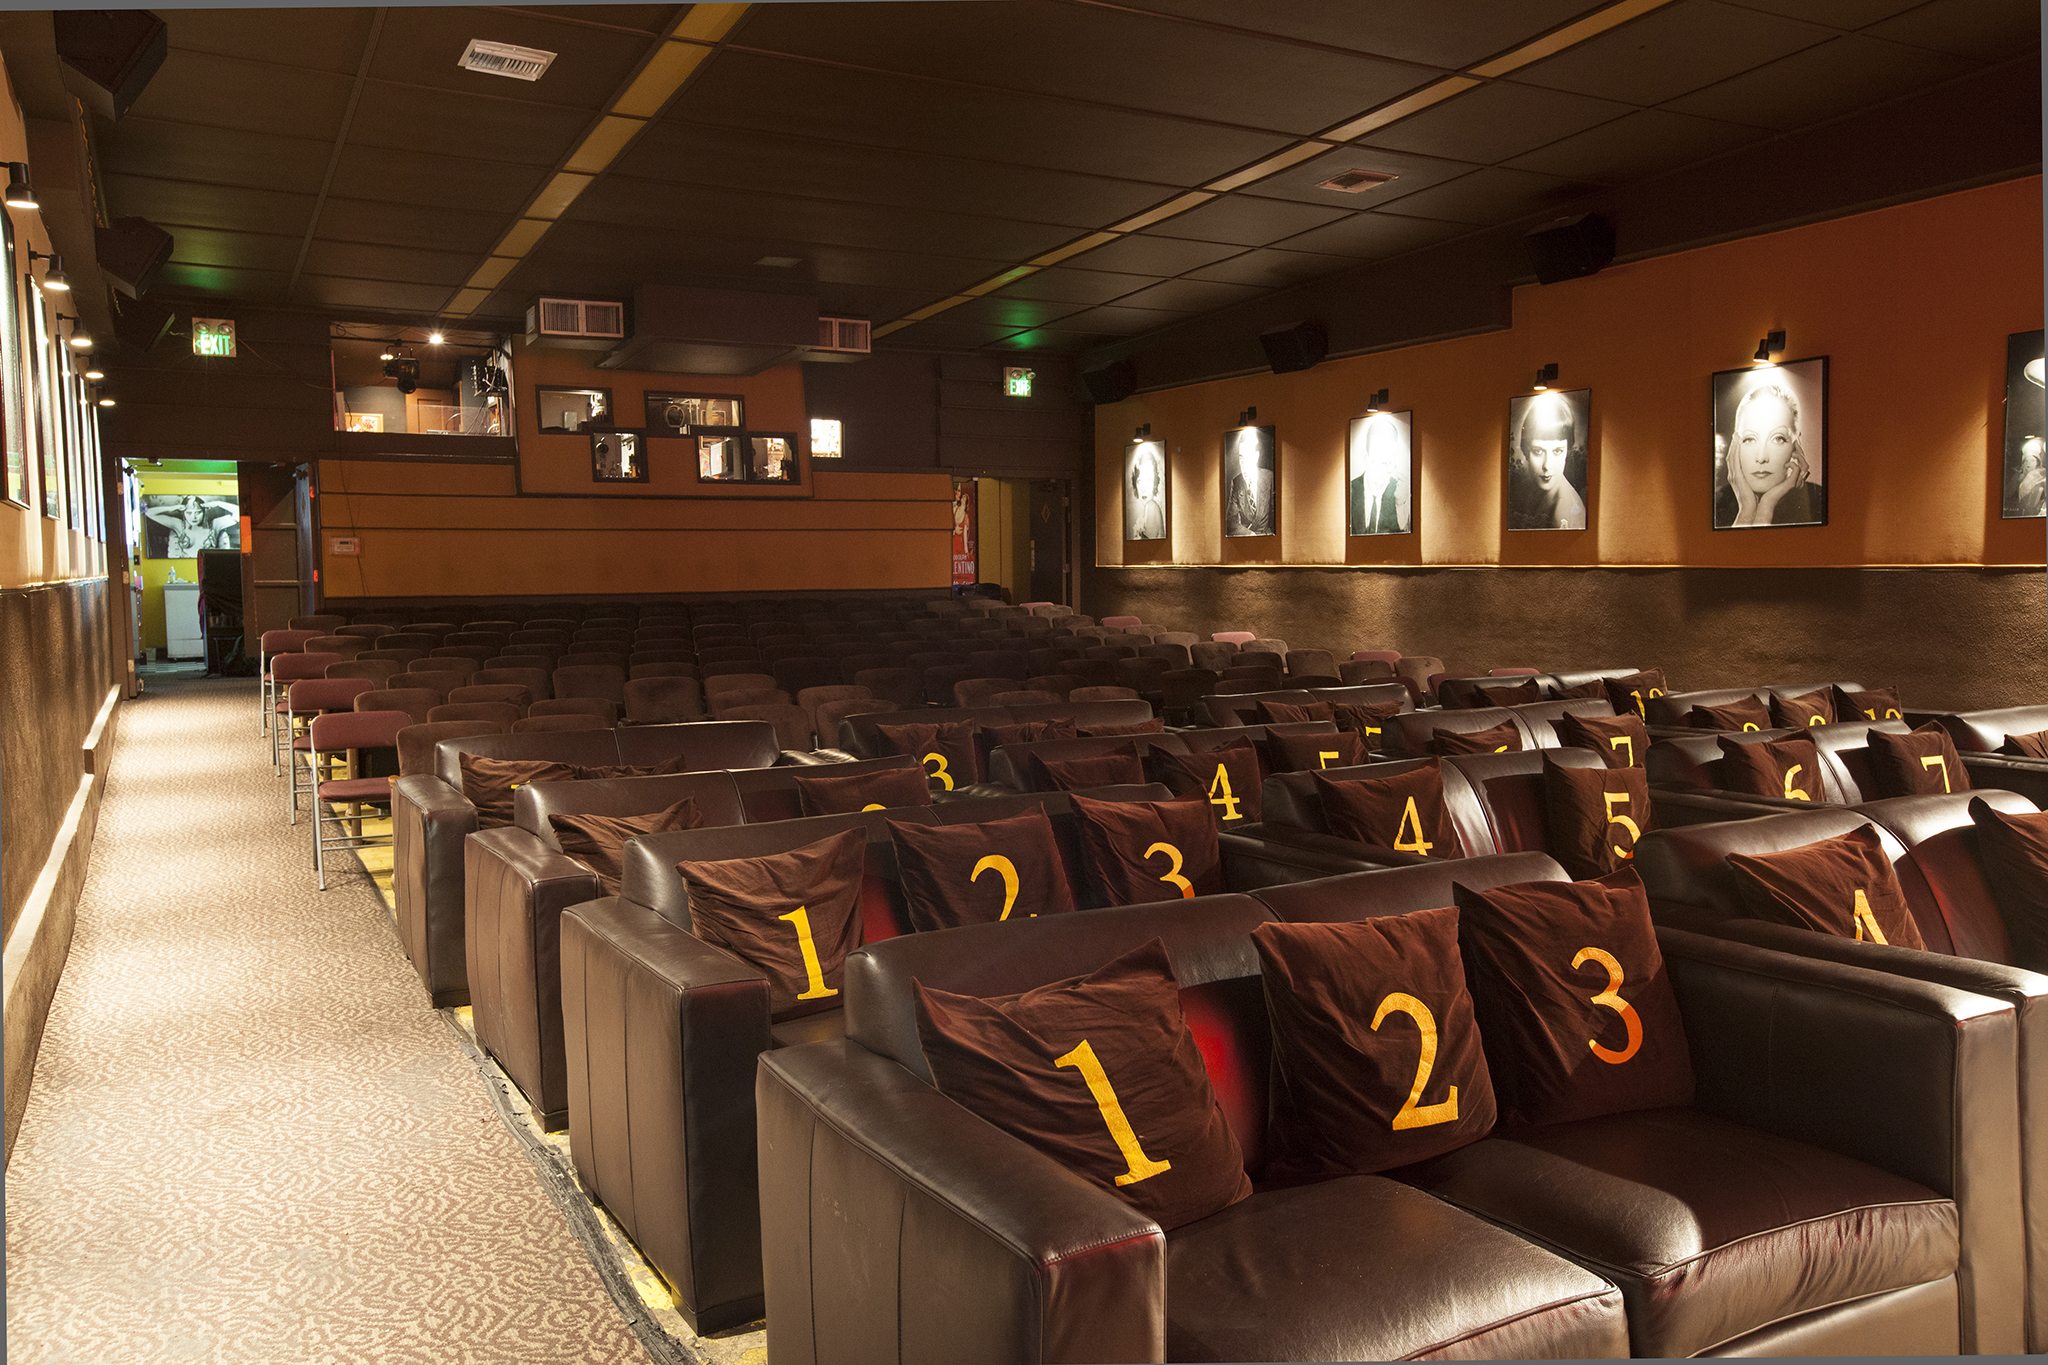 Best arthourse cinema: Cinefamily at the Silent Movie Theatre